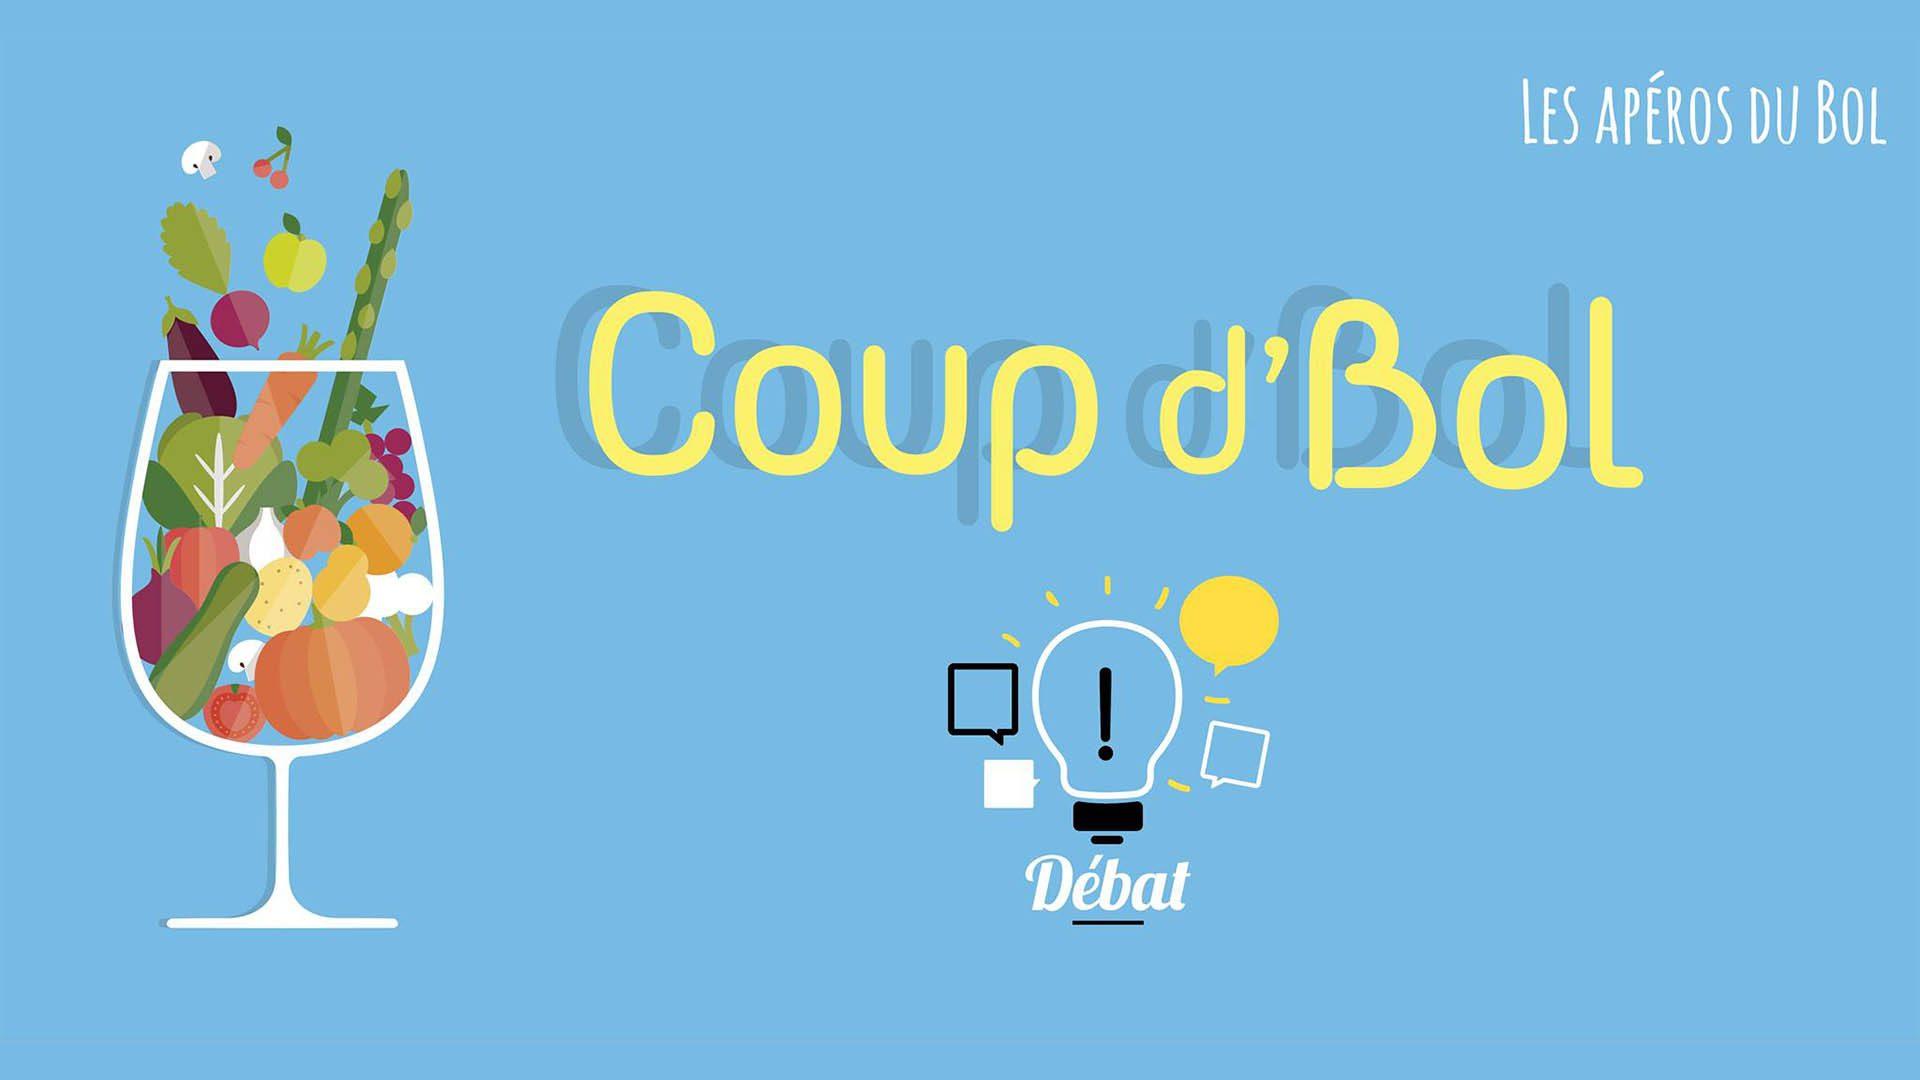 Apero-Debat-Coup-de-Bol-1oct2019